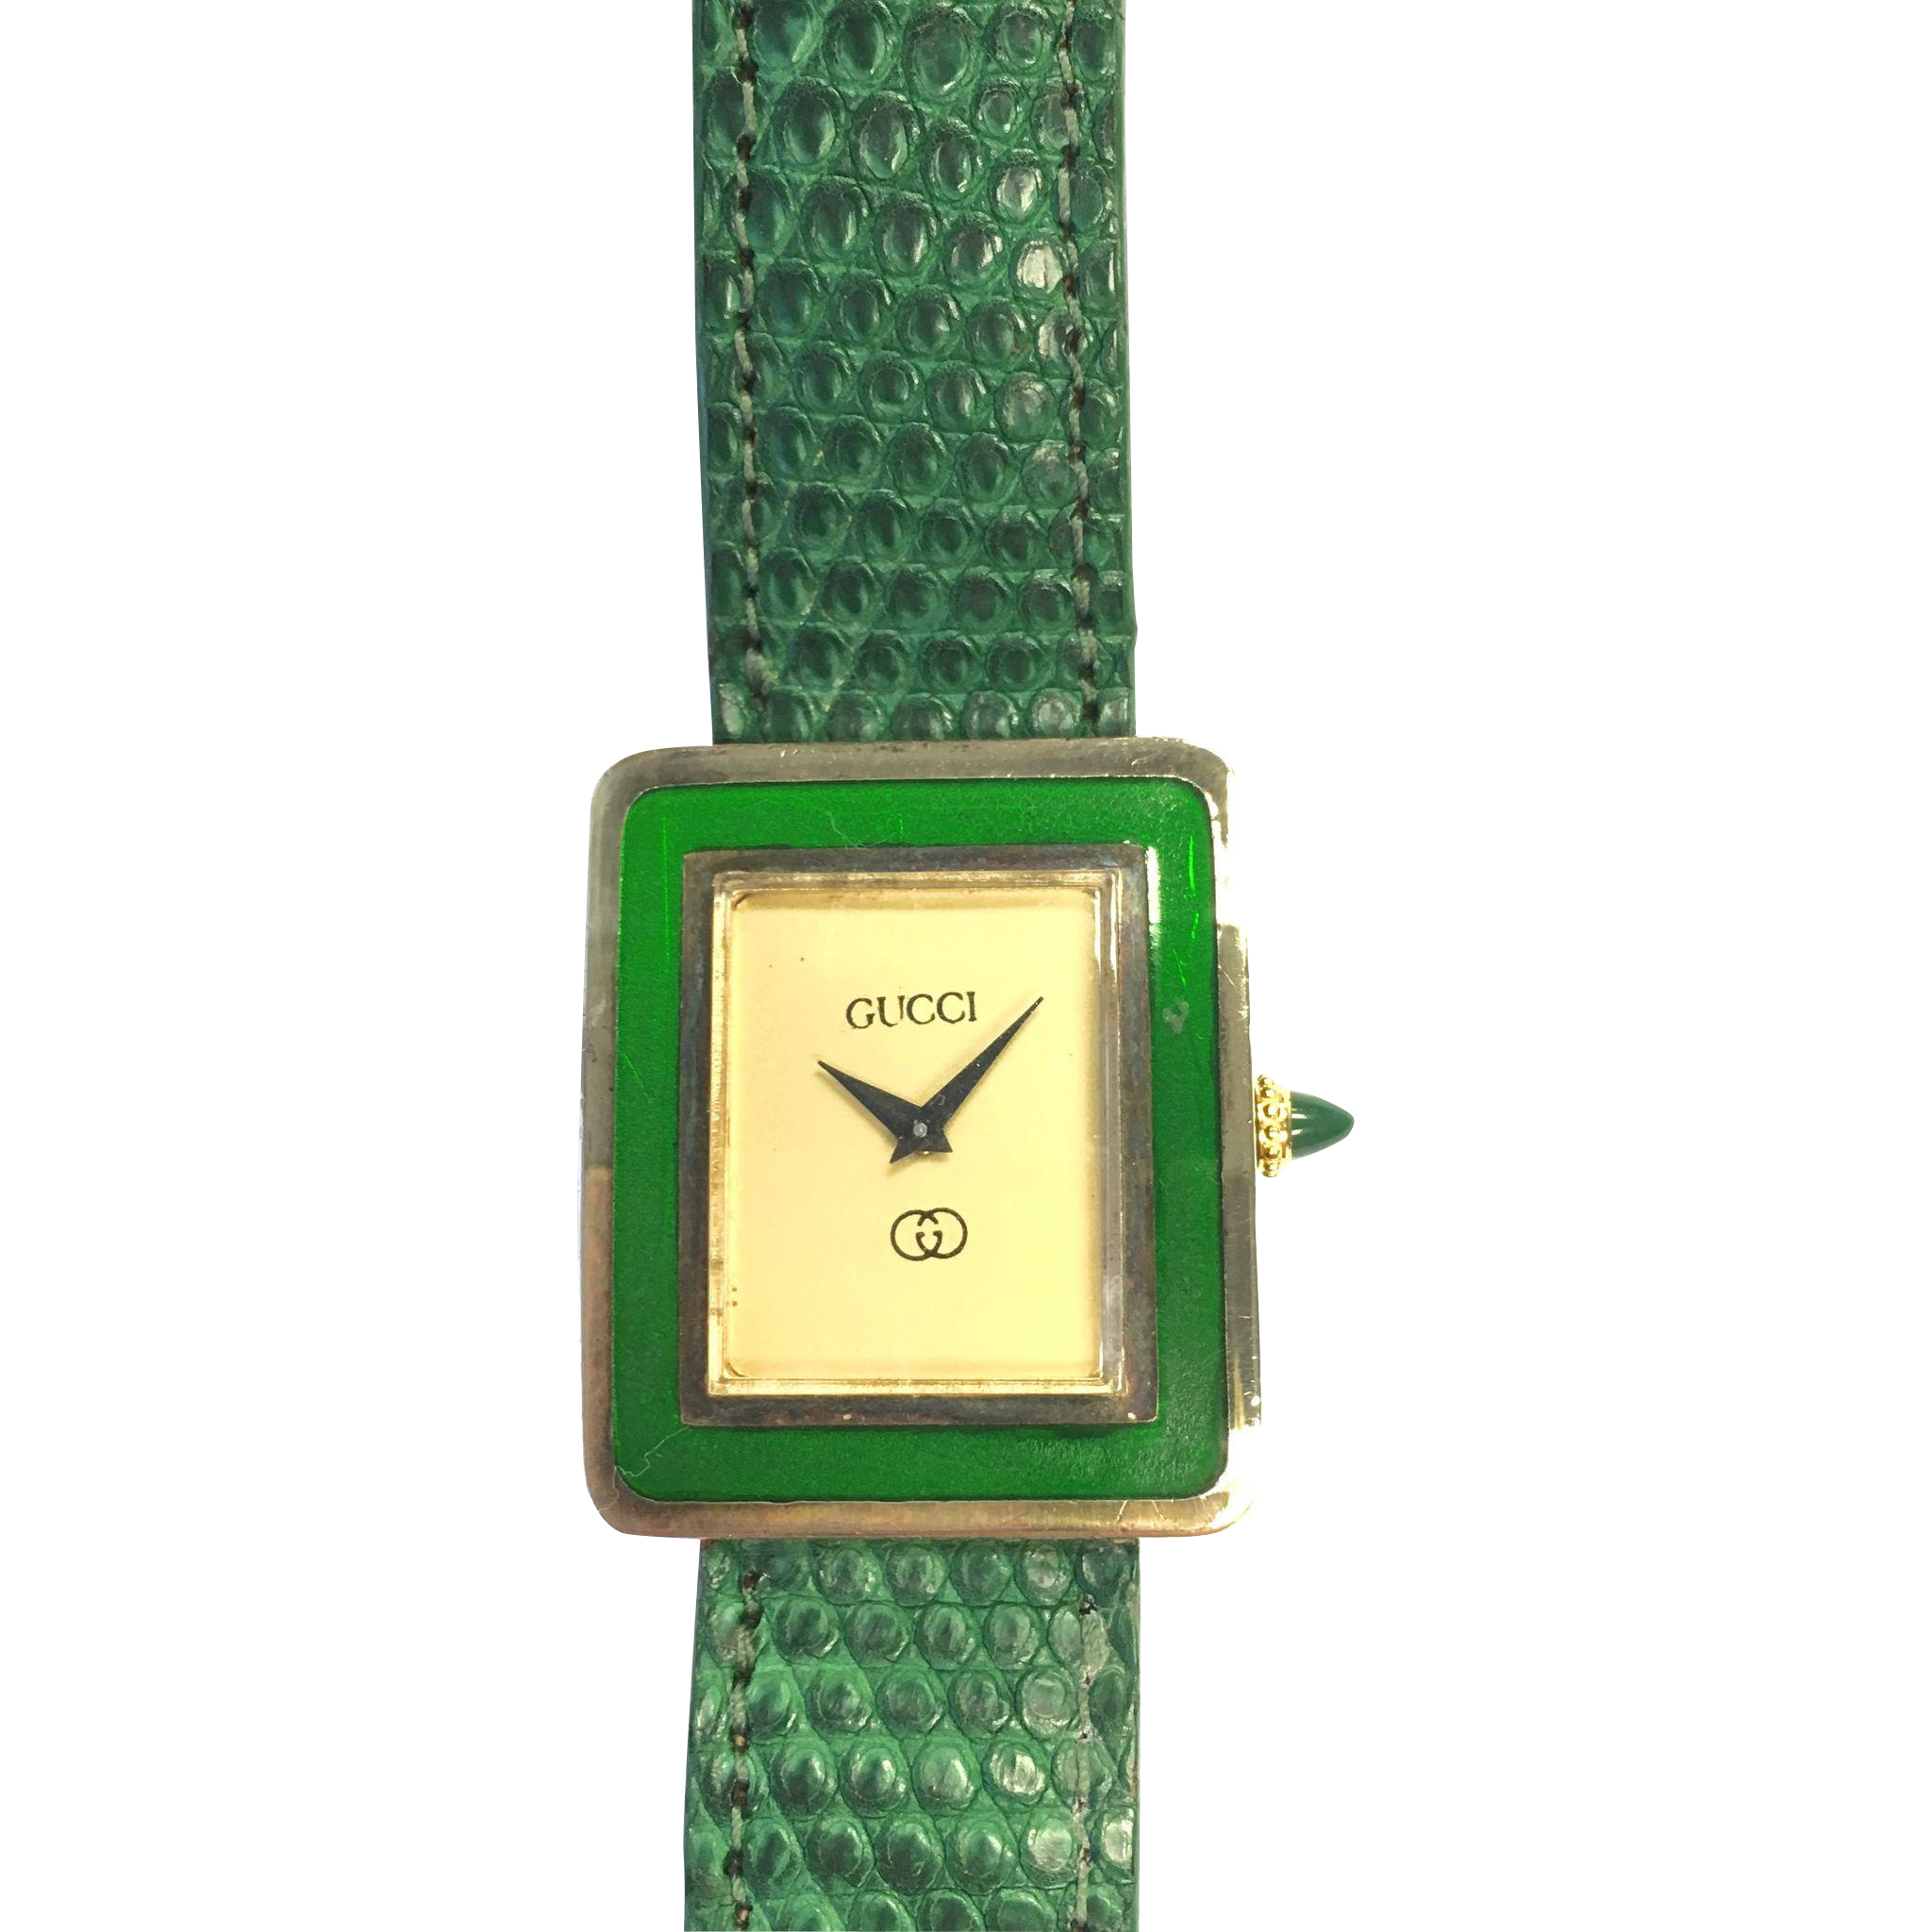 rare vintage classic gucci green enamel vermeil manual wind watch rh pinterest com I-Gucci Digital I Fake Gucci